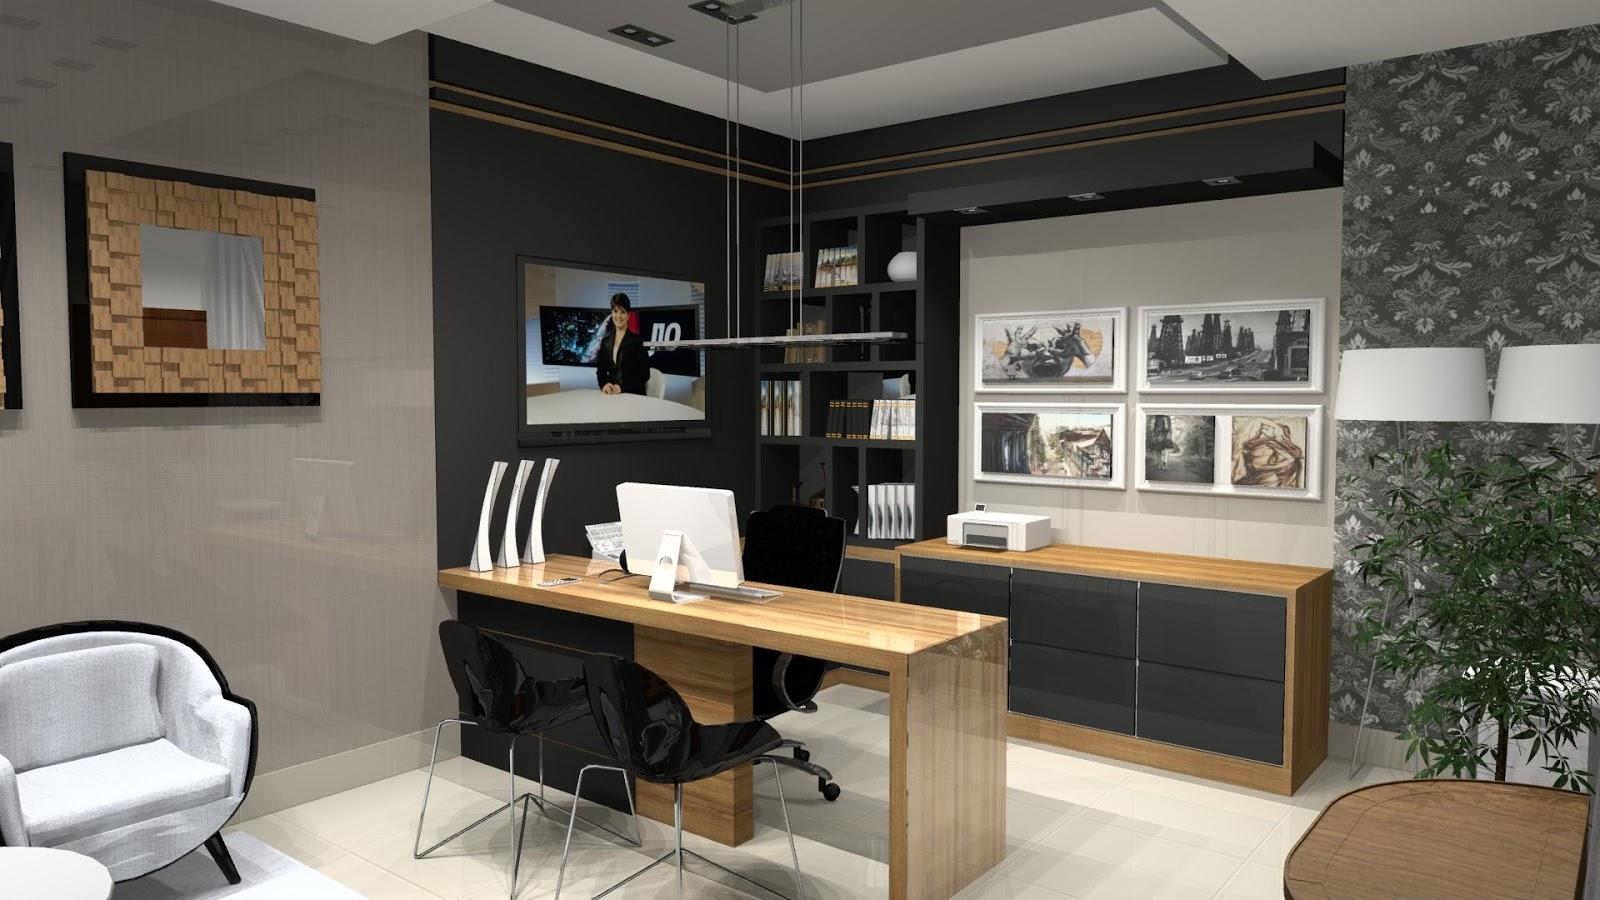 Melamiprog team up7 promob studio 5 for Programas de diseno de interiores para windows 8